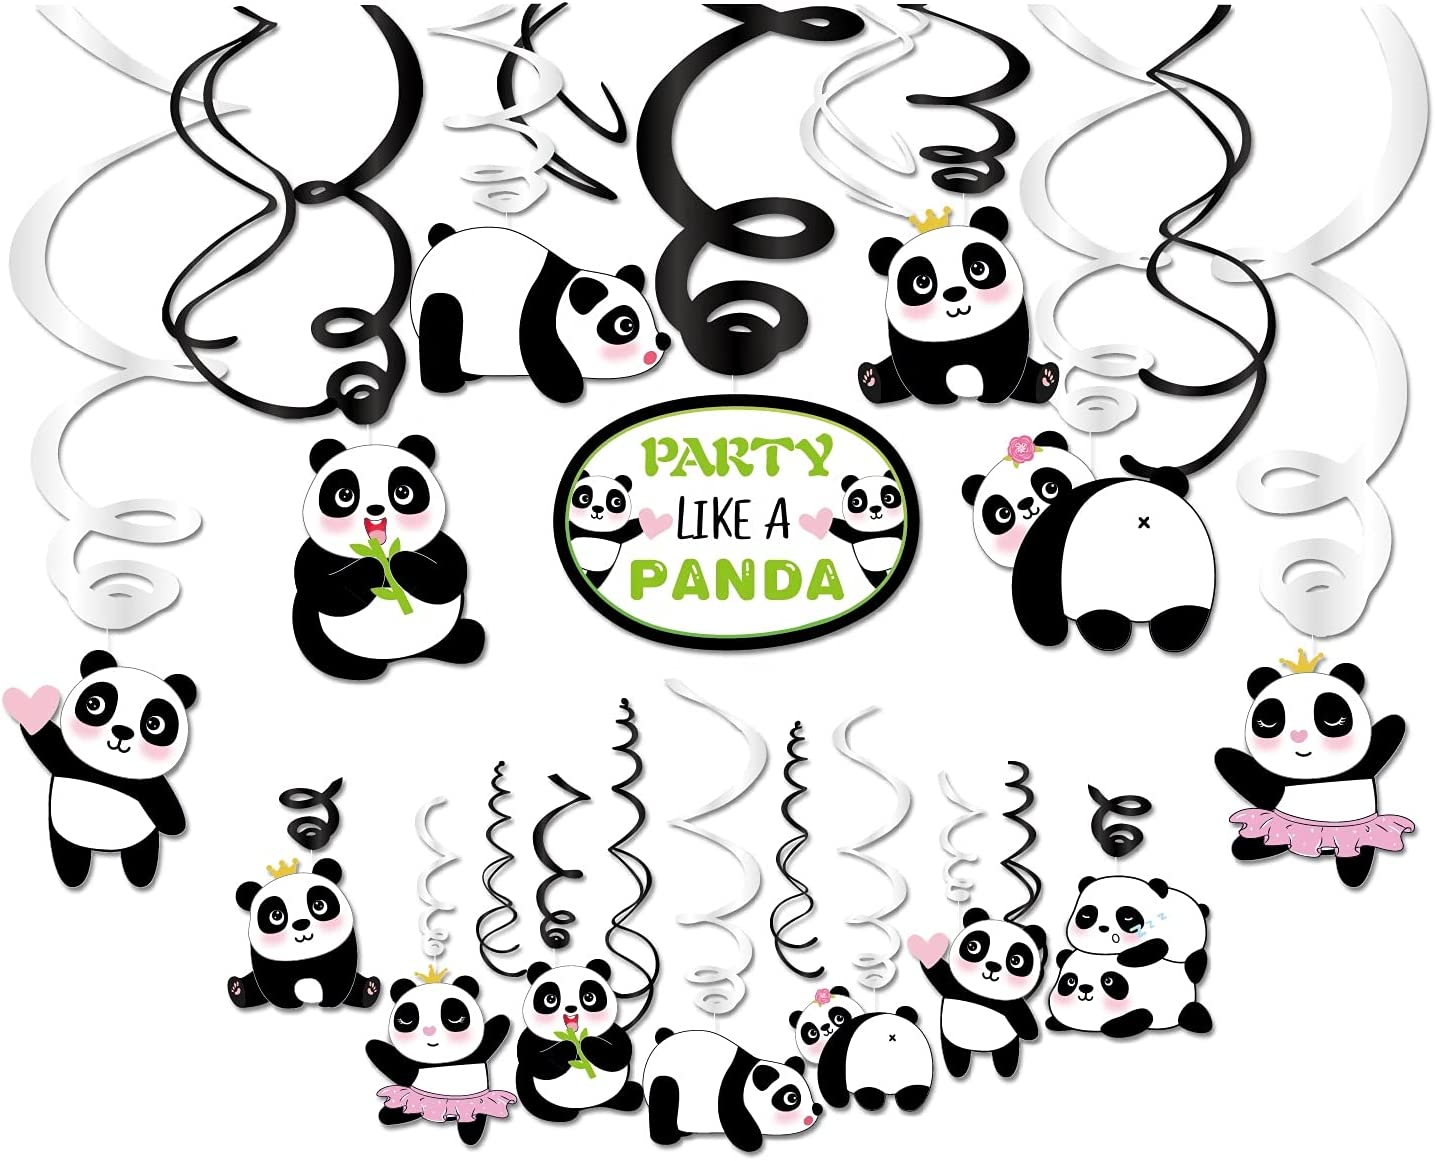 Kristin Paradise 30Ct Panda Hanging Swirl Decorations, Panda Bear Party Supplies, Like a Panda Birthday Theme Decor for Boy Girl Baby Shower, 1st Bday Favors Idea